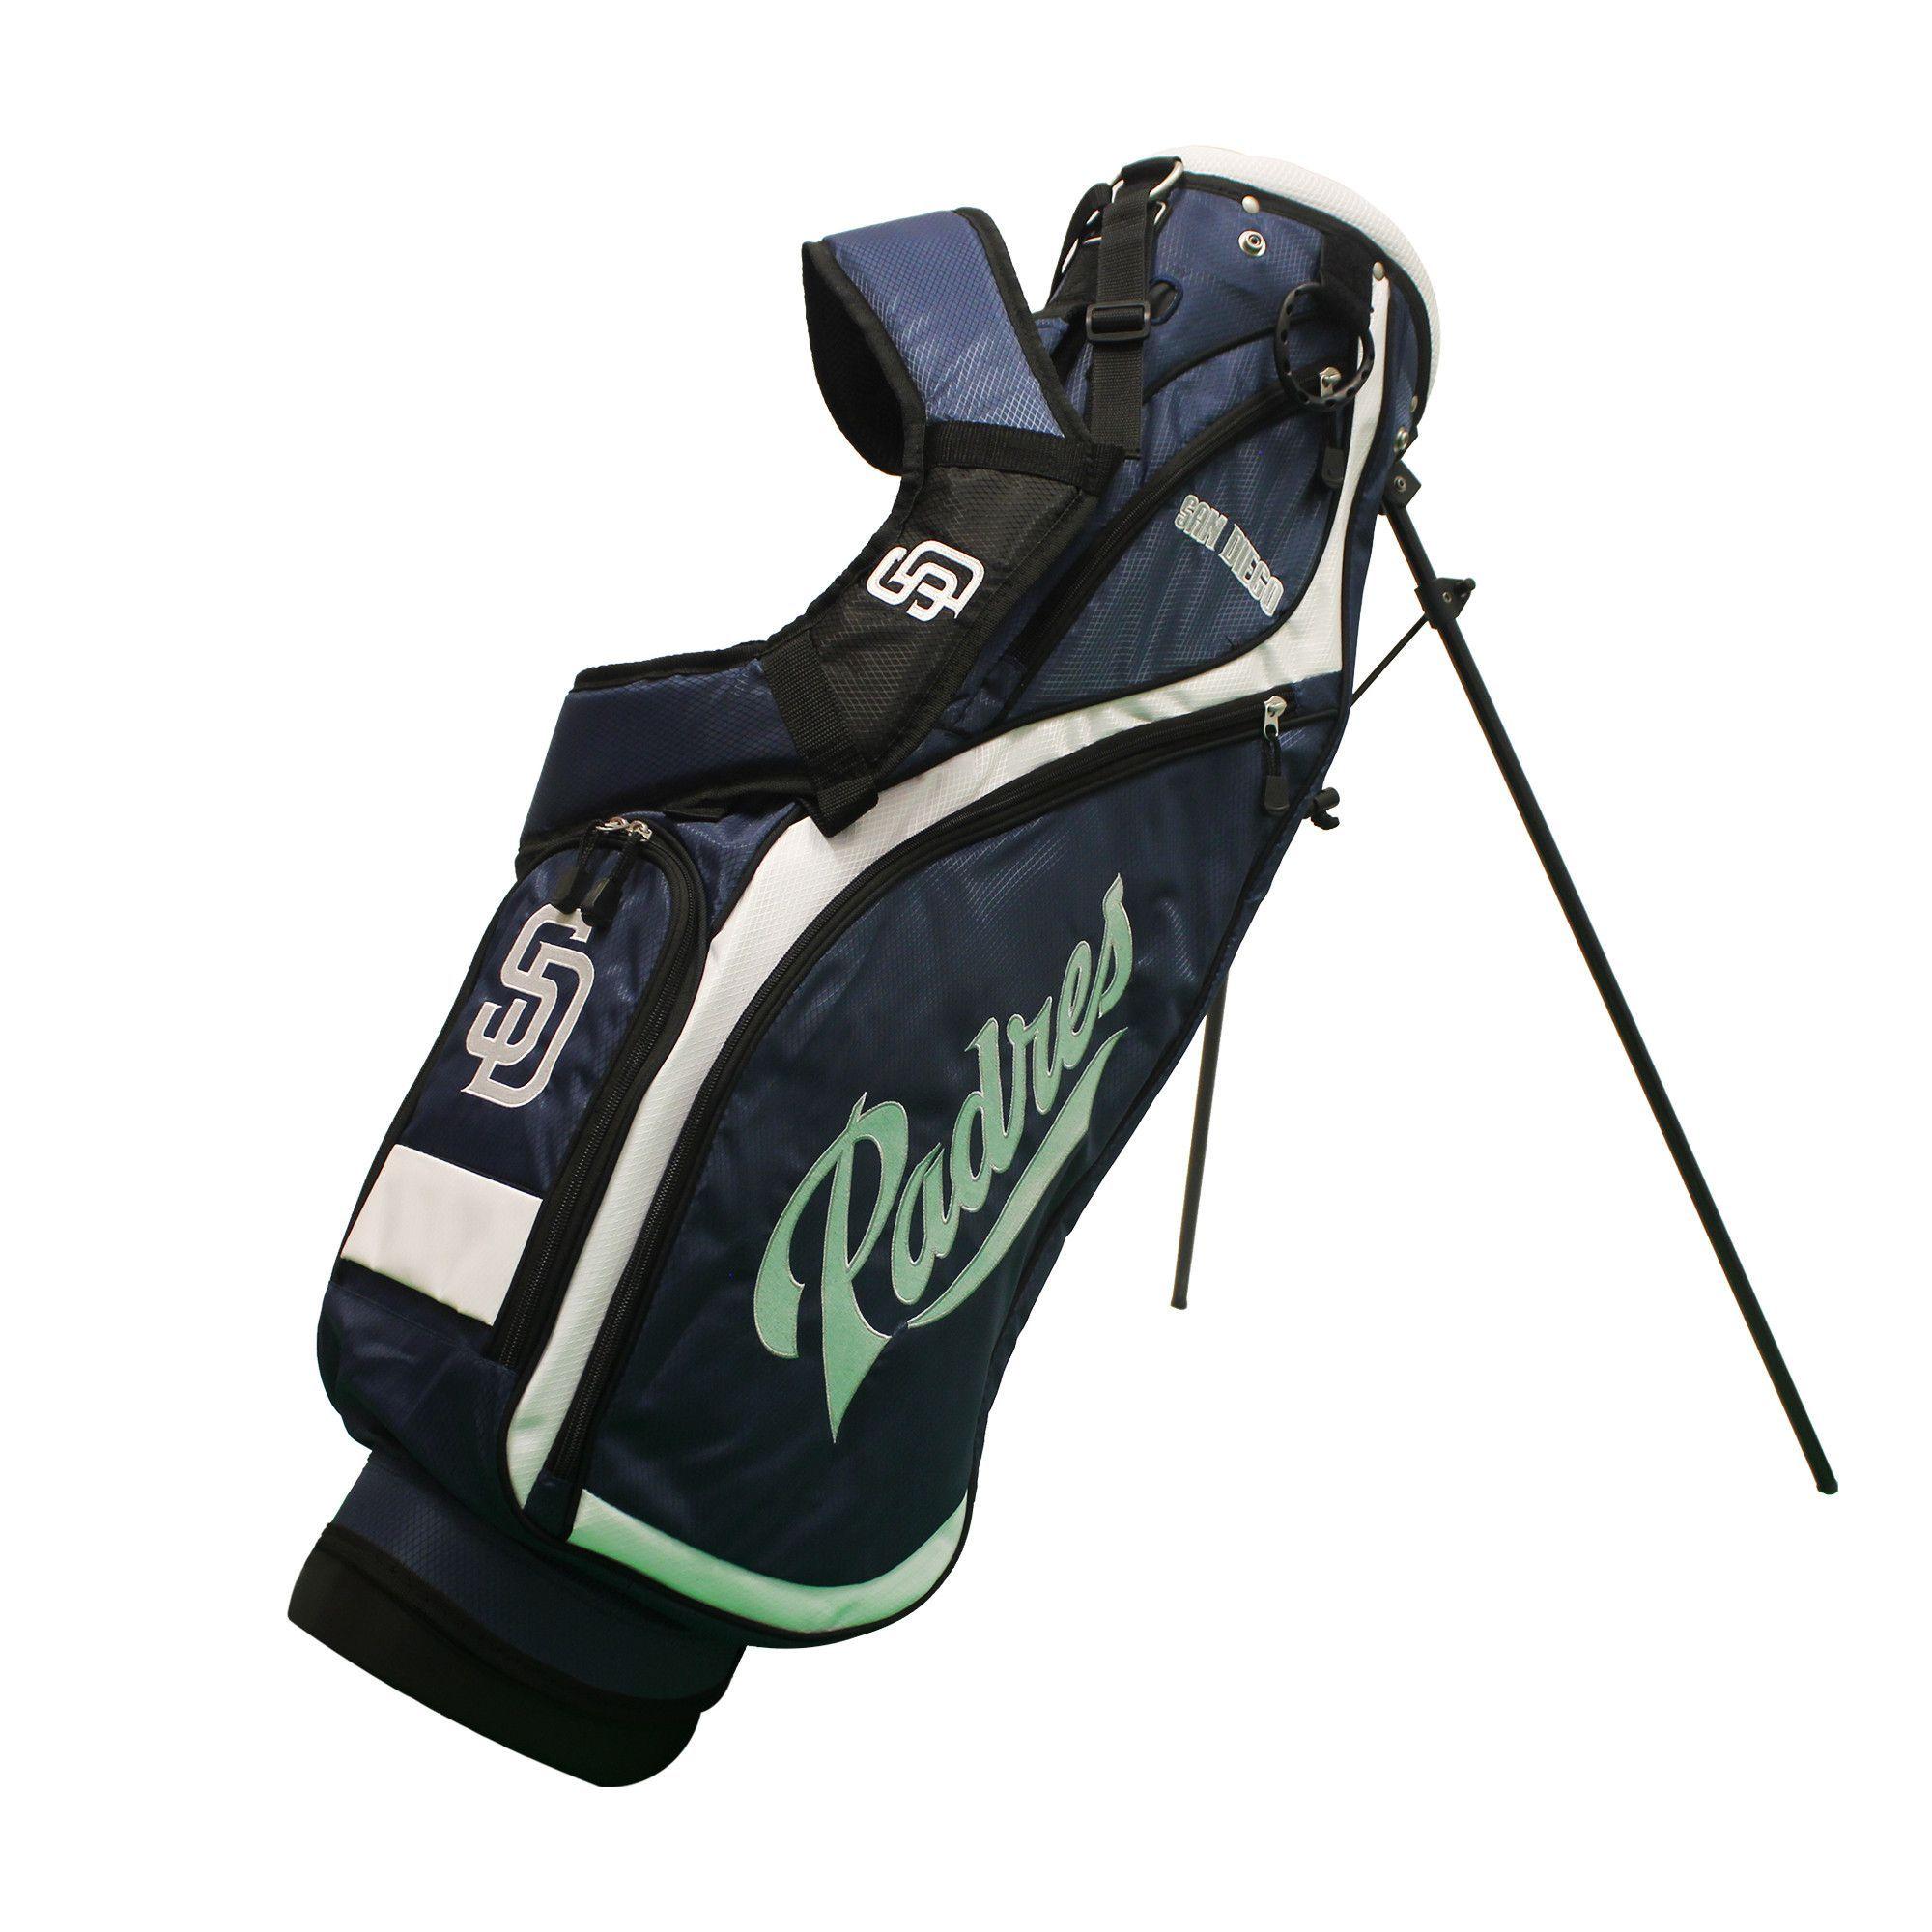 80ede65003c Team Golf San Diego Padres Nassau Golf Stand Bag. This Nassau Stand bag is a